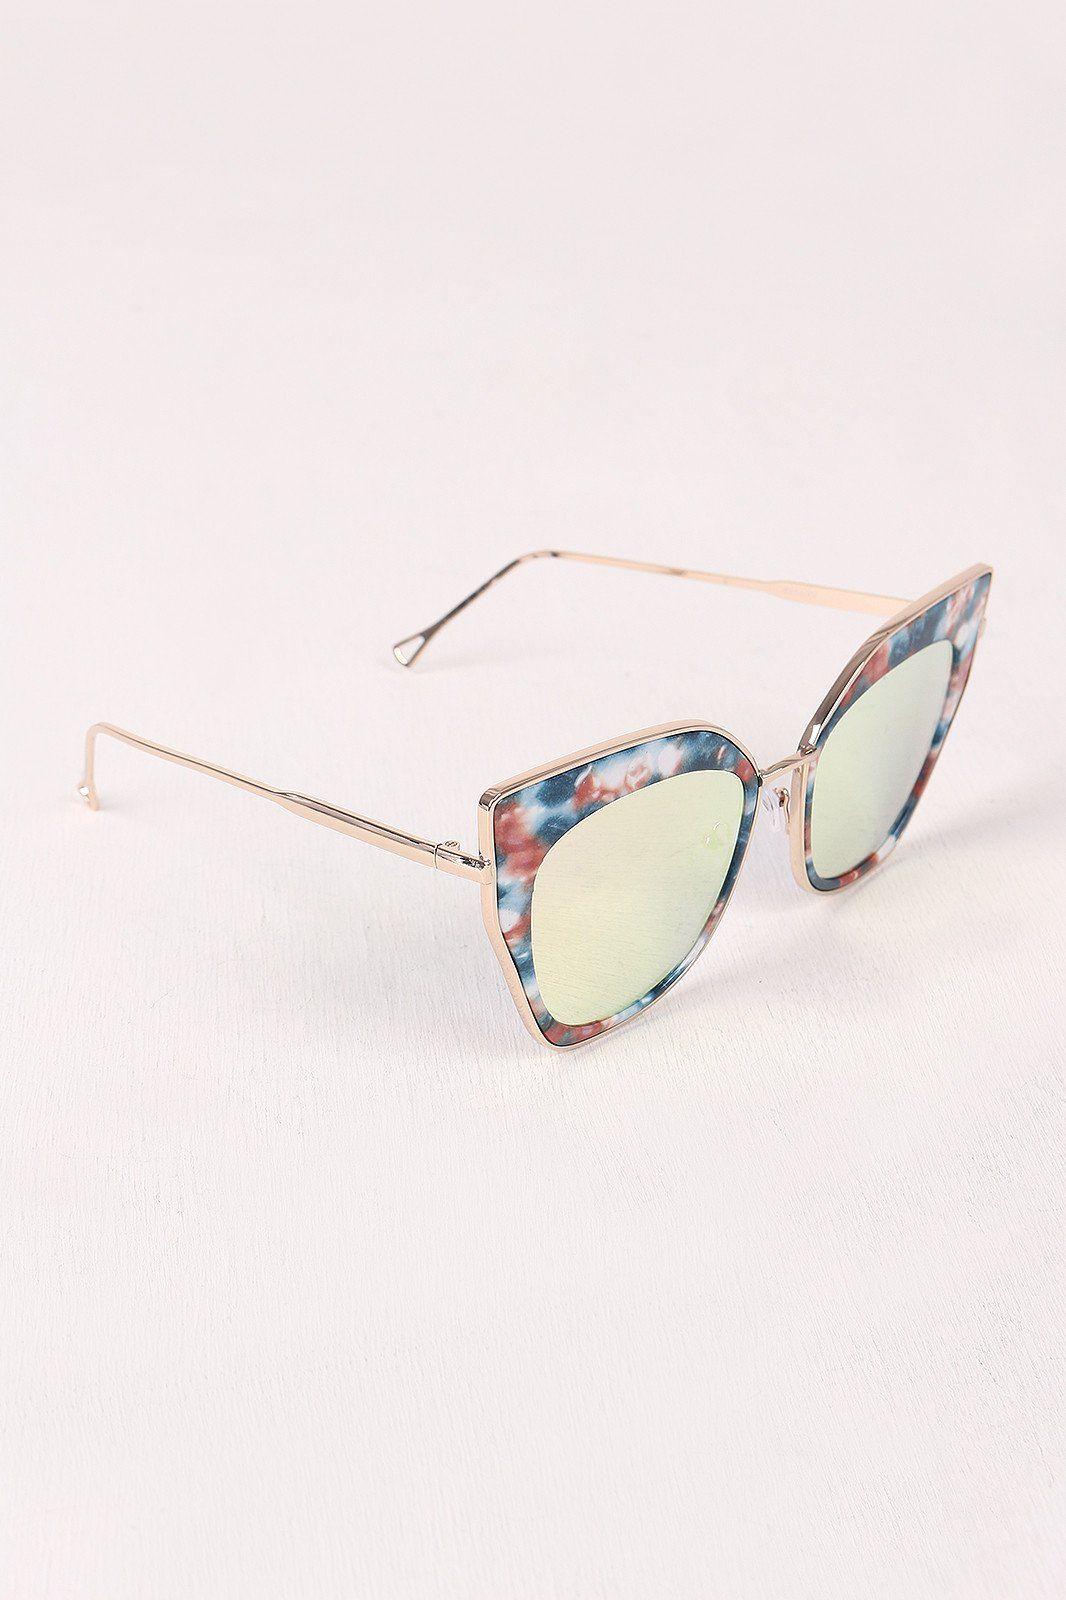 675374697d7c Printed Plastic And Metal Frame Mirrored Cat Eye Sunglasses ...